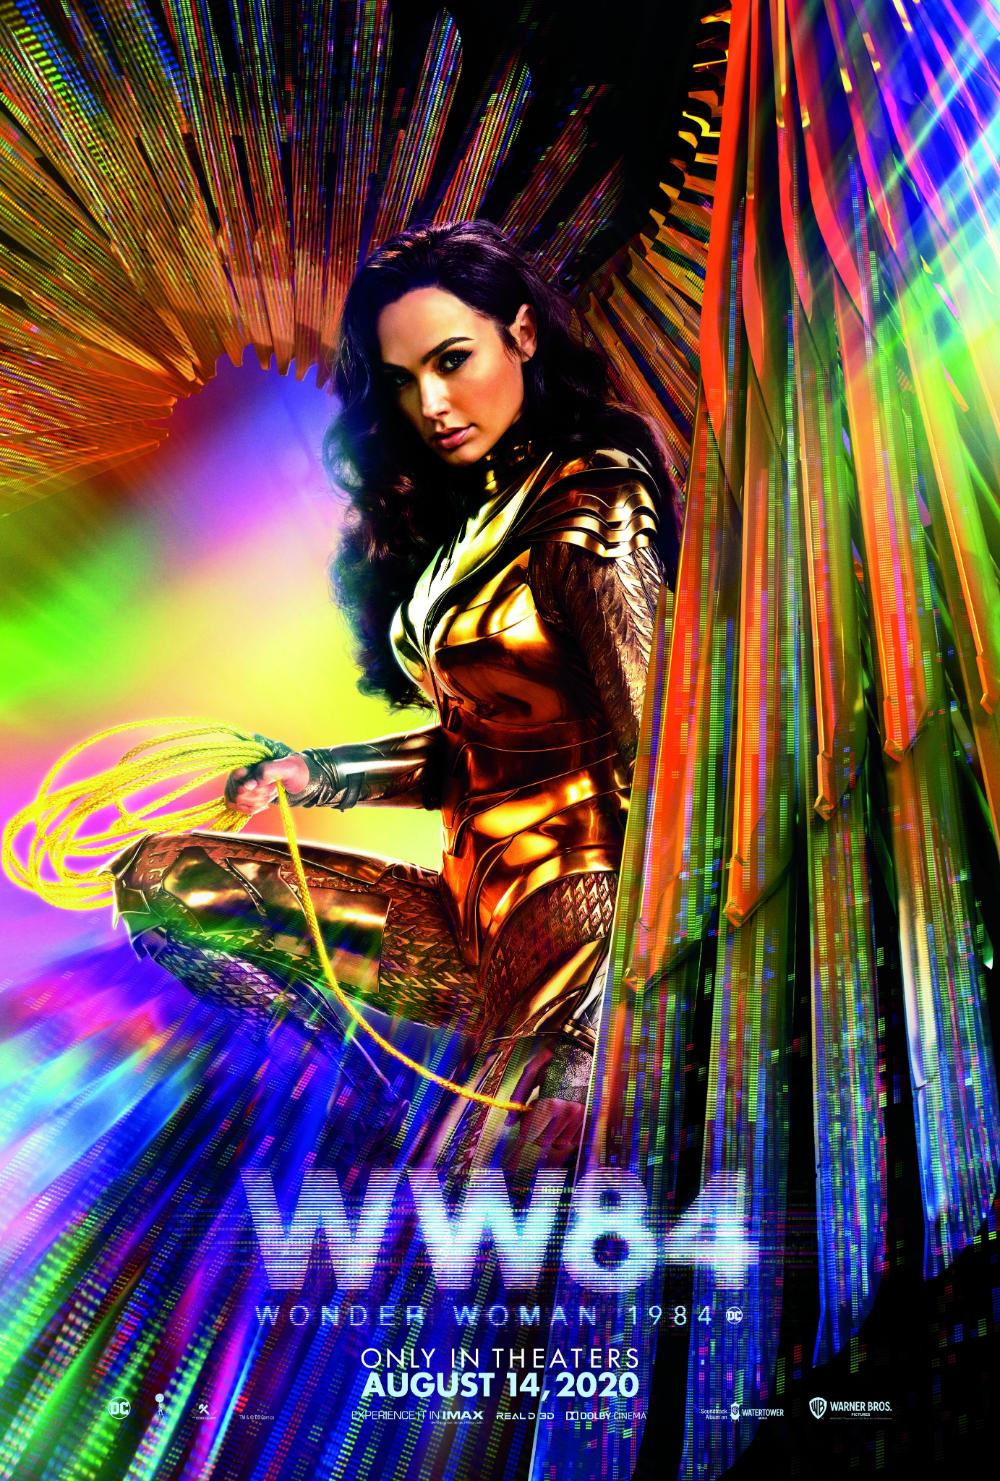 Dc Unlimited On Twitter Peliculas De Superheroes Peliculas Fantasia Mujer Maravilla Comic